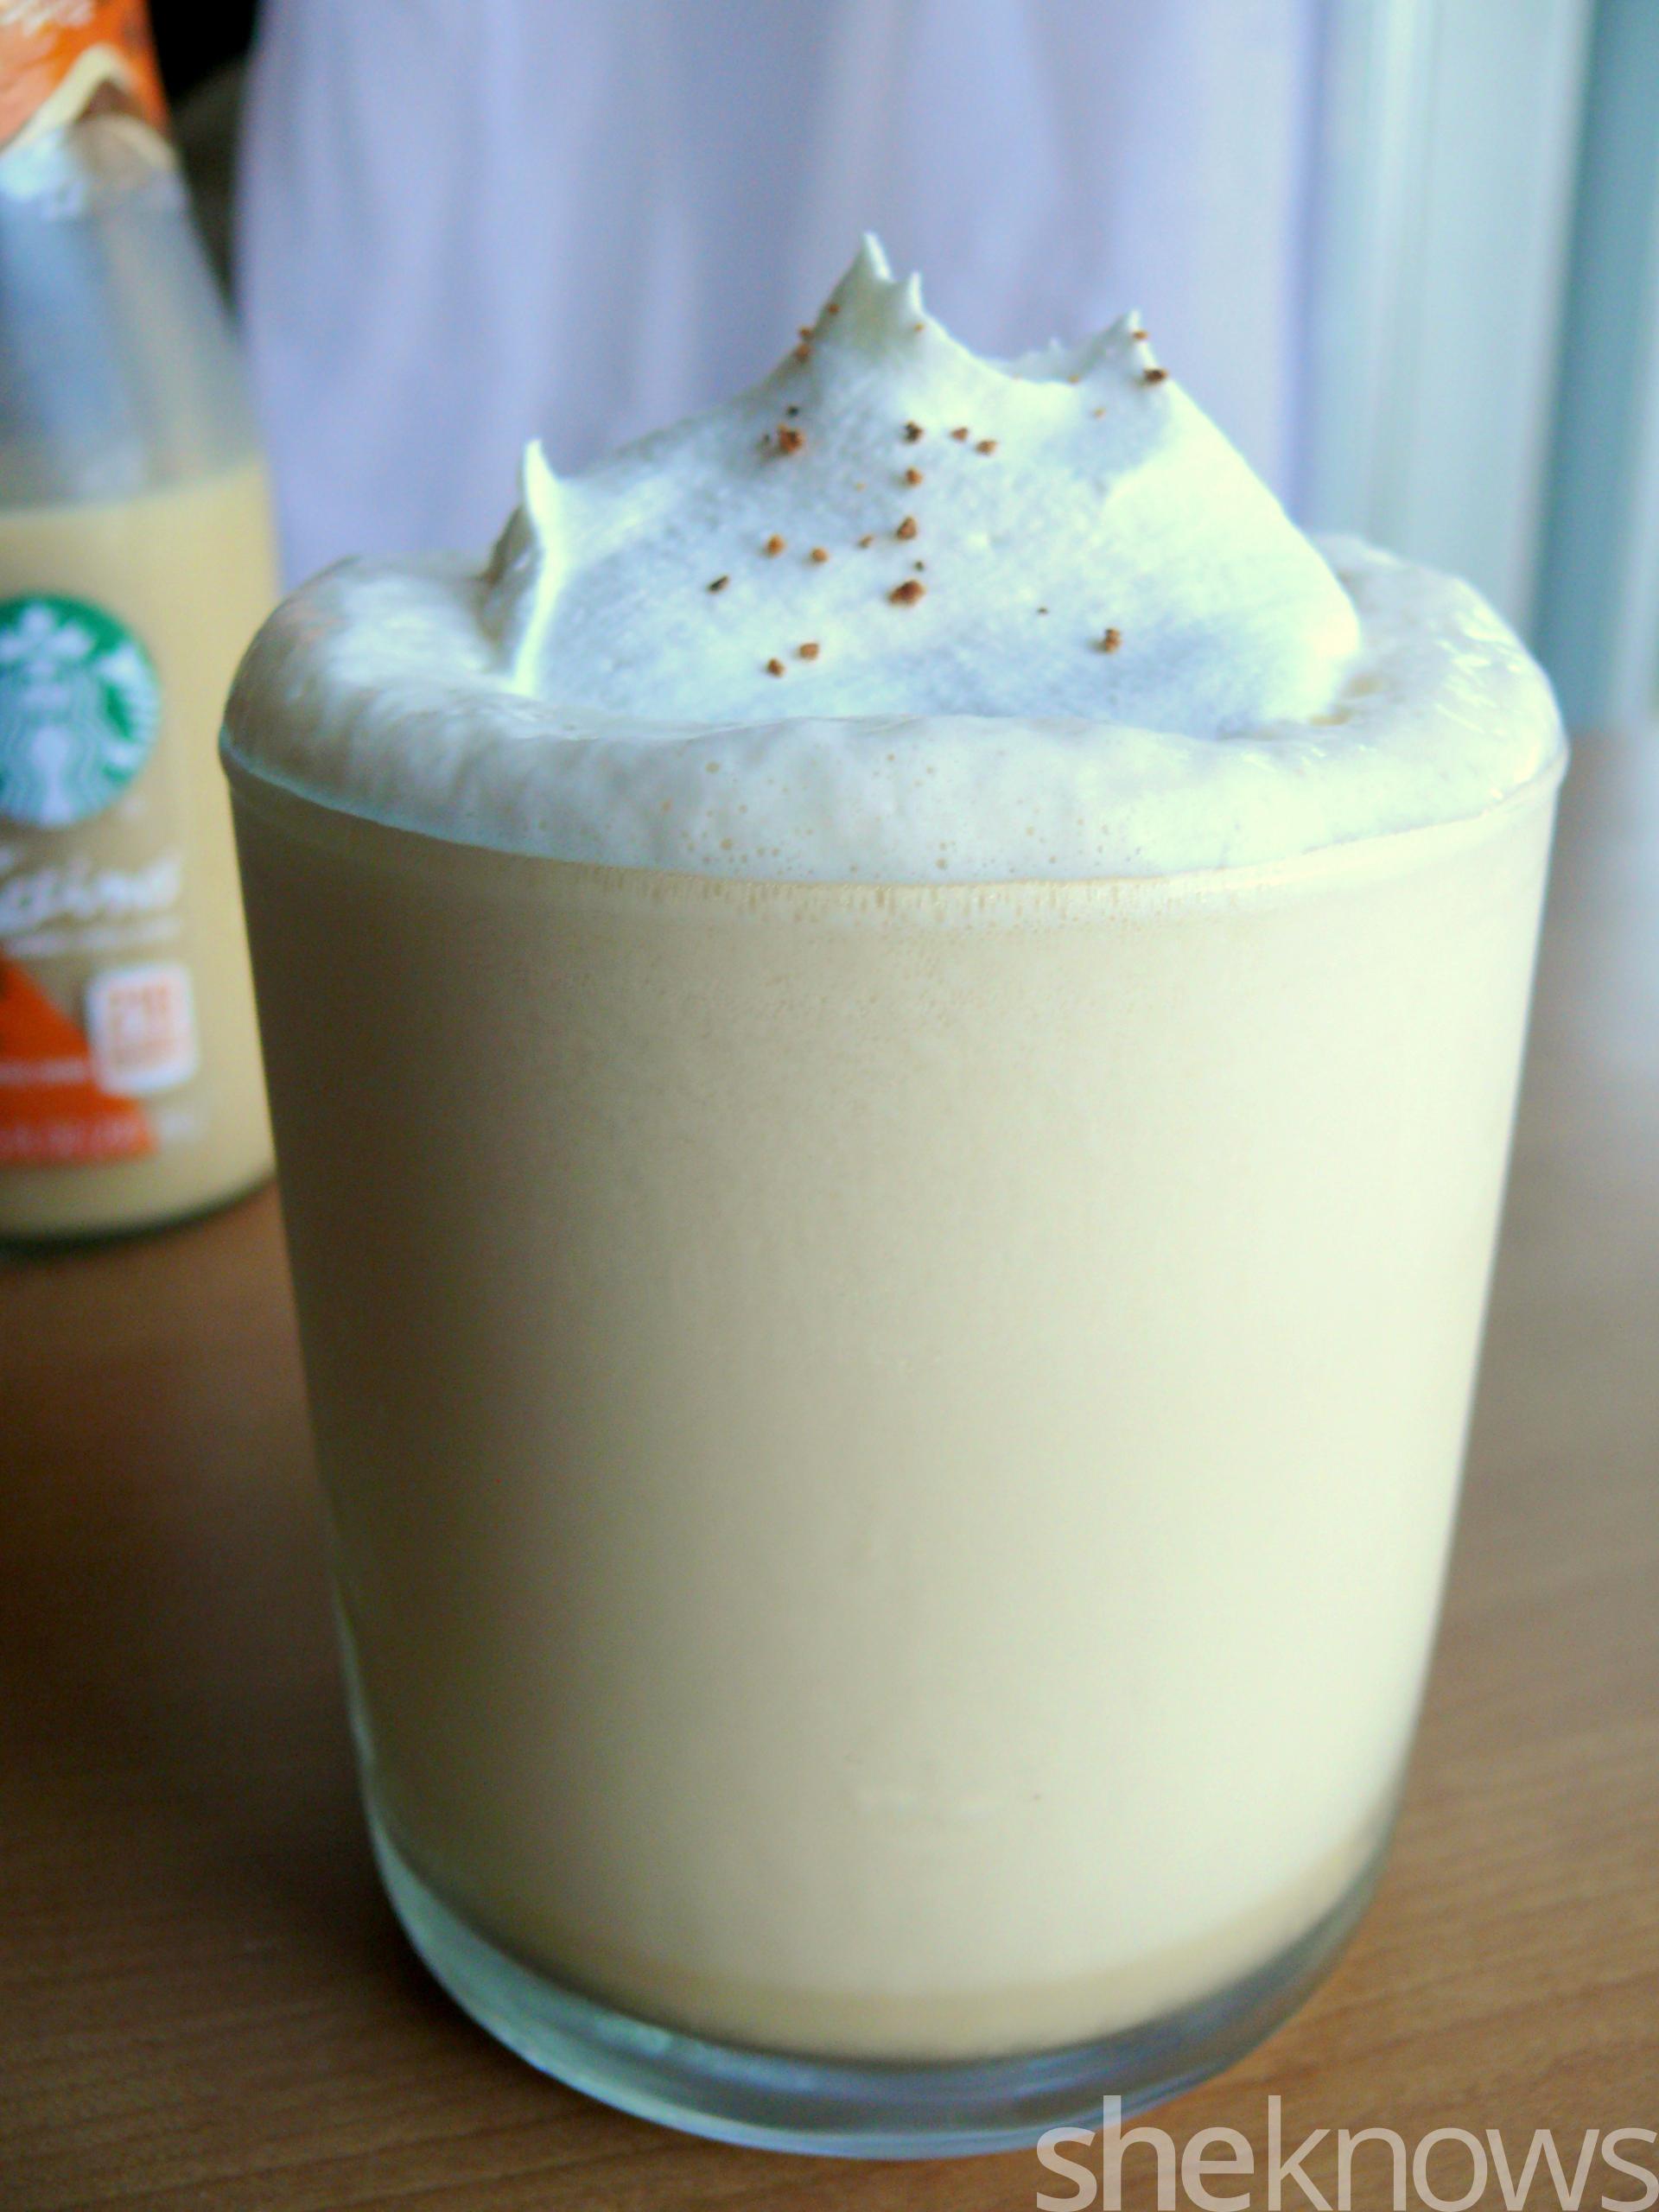 Starbucks bottled blended pumpkin spice frappuccino